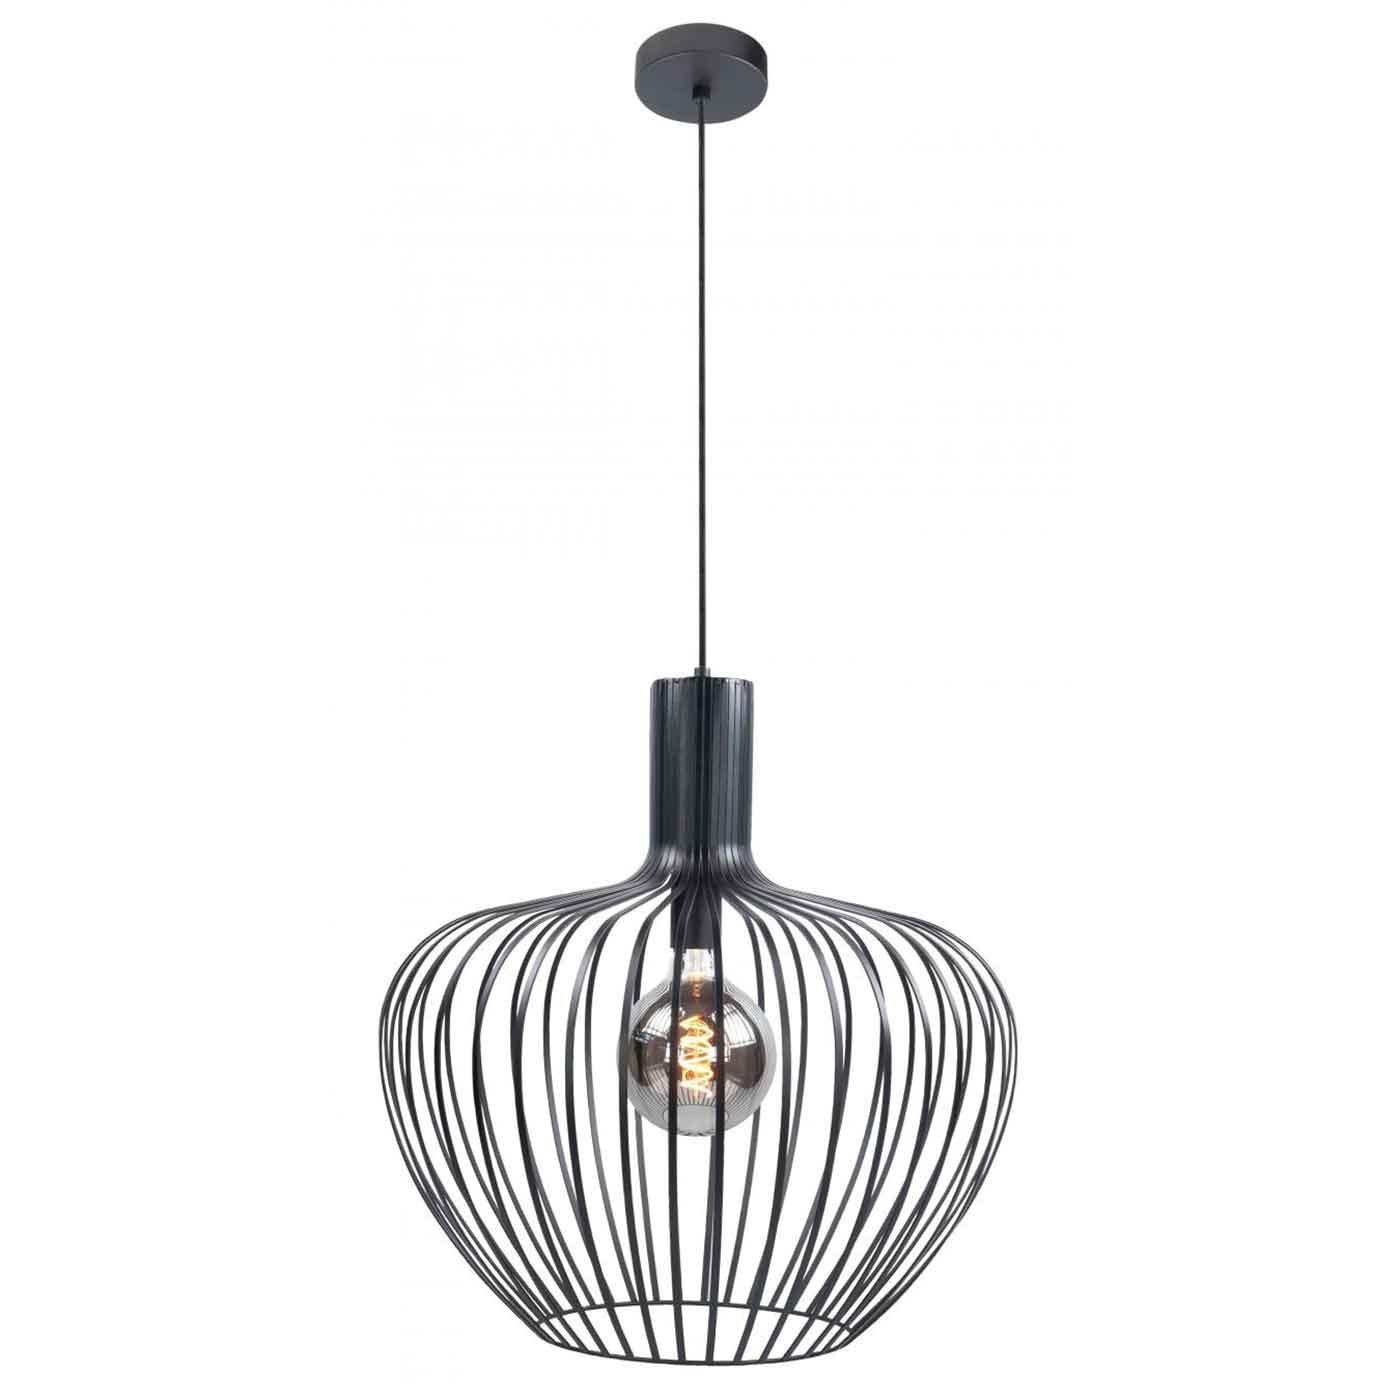 Highlight Hanglamp Mela Ø 50 cm zwart